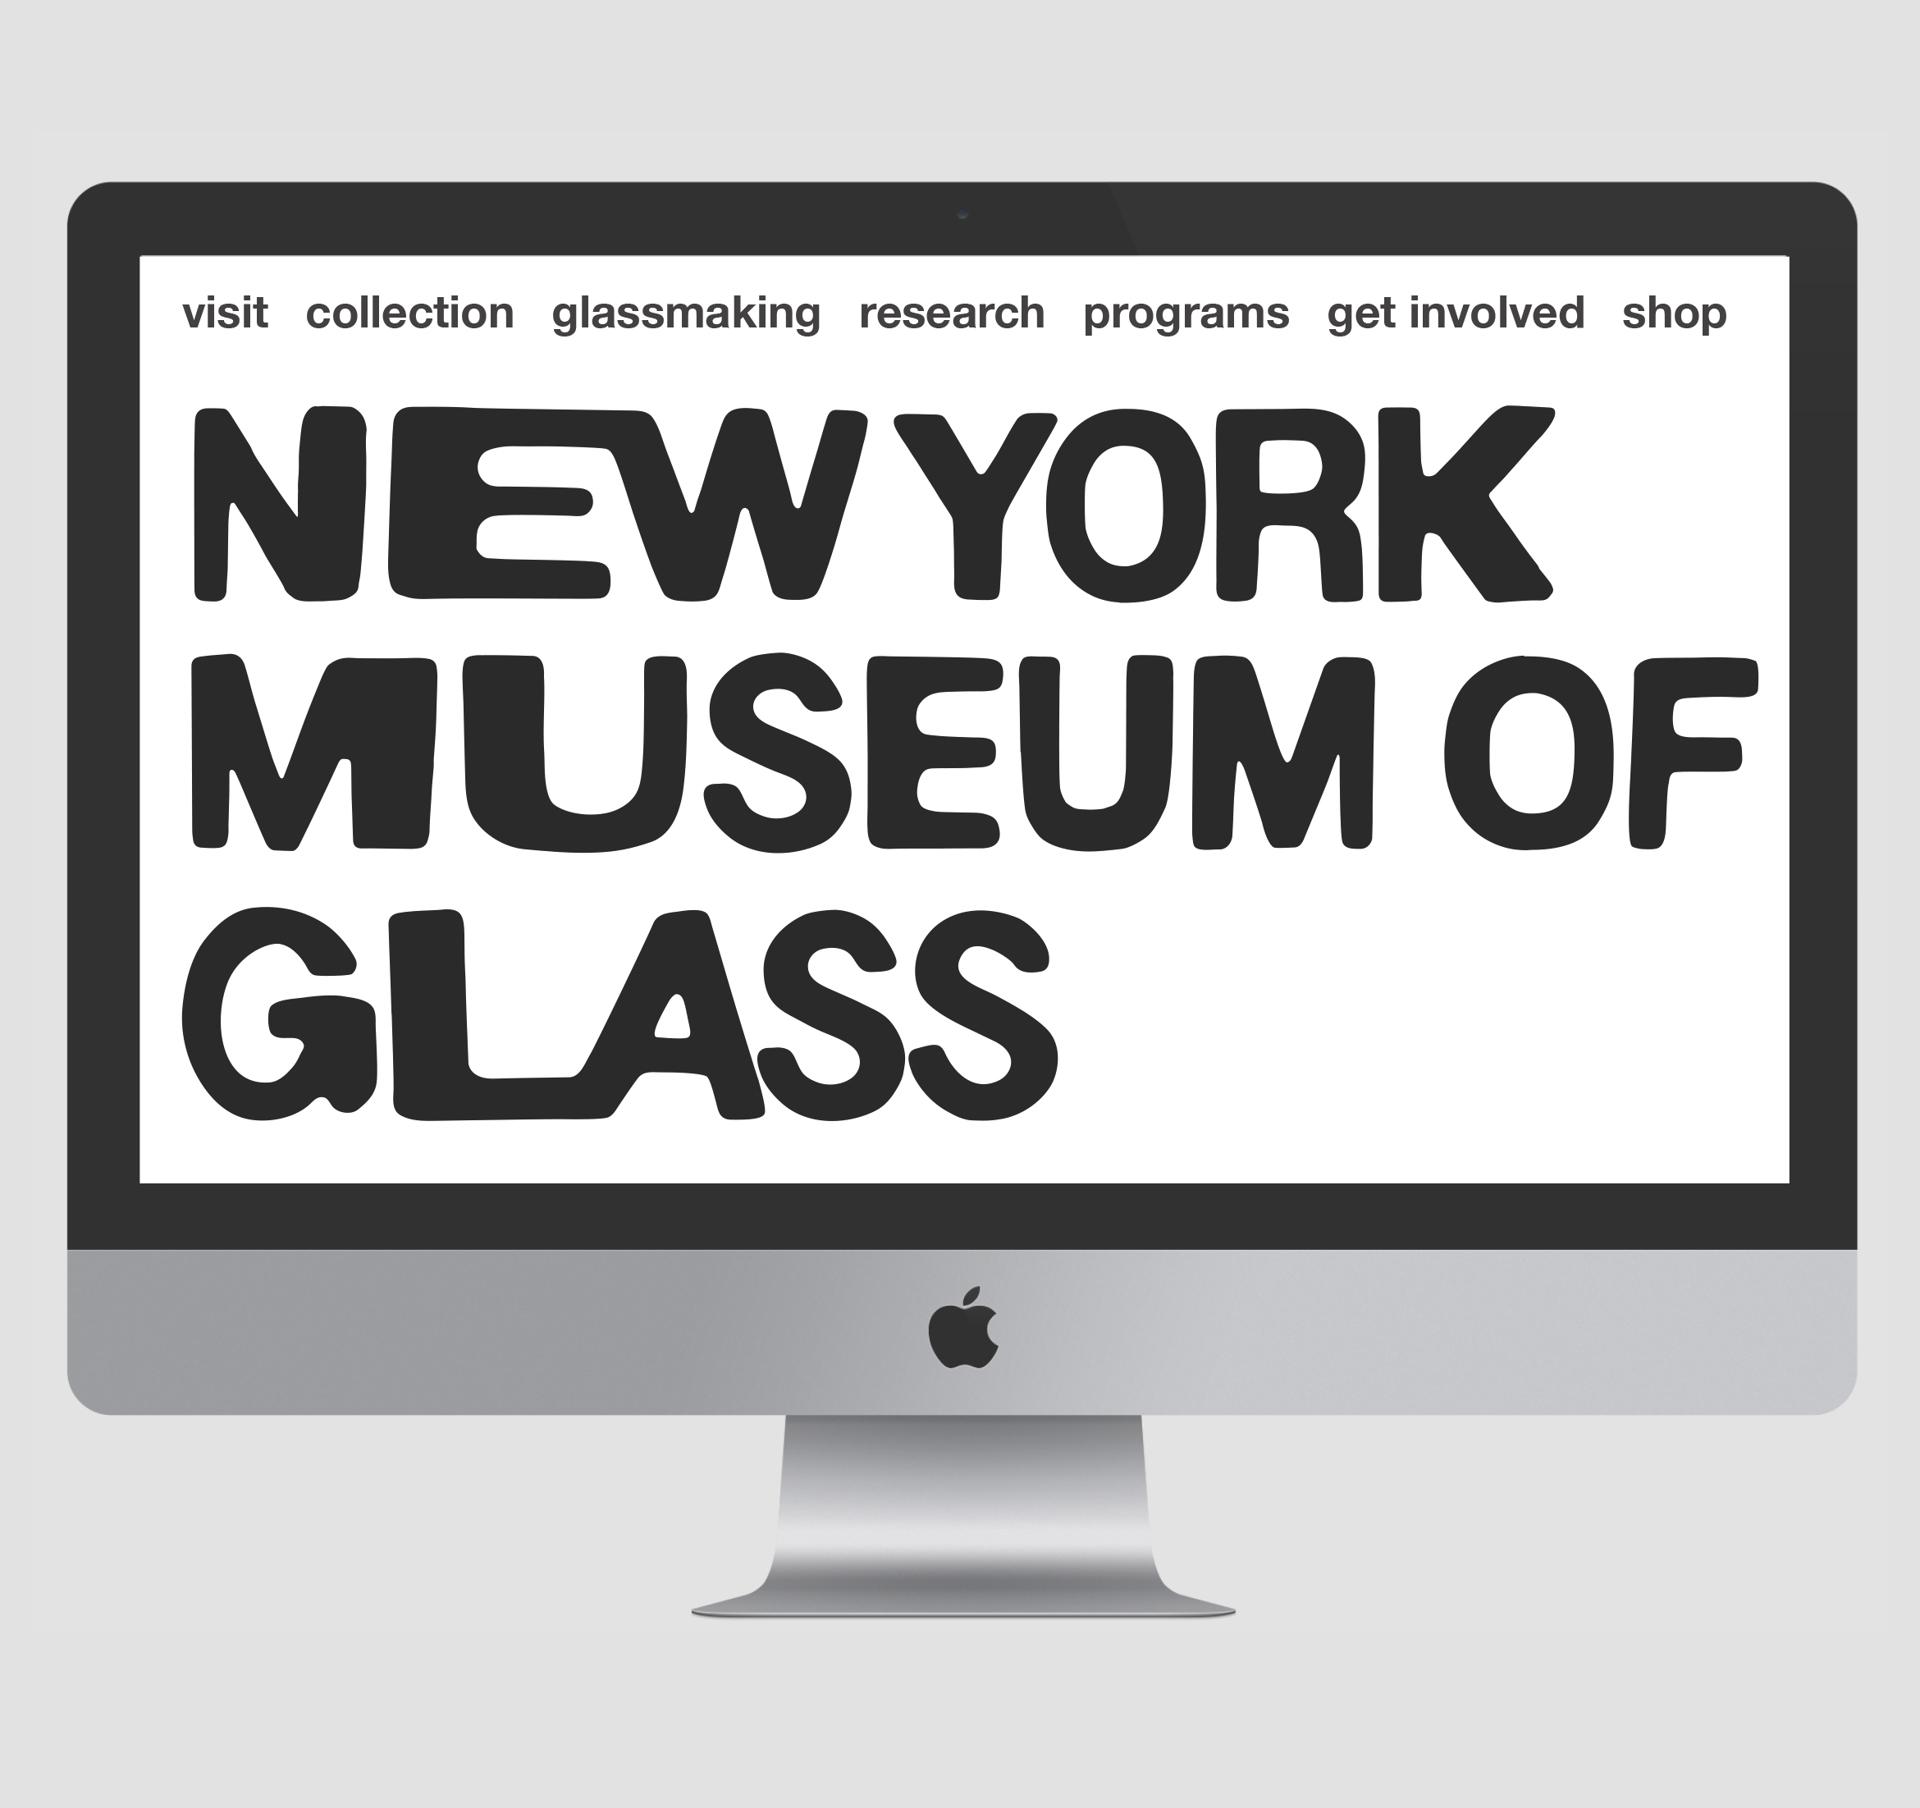 New-York-Museum-of-Glass-Leo-Porto-08.jpg